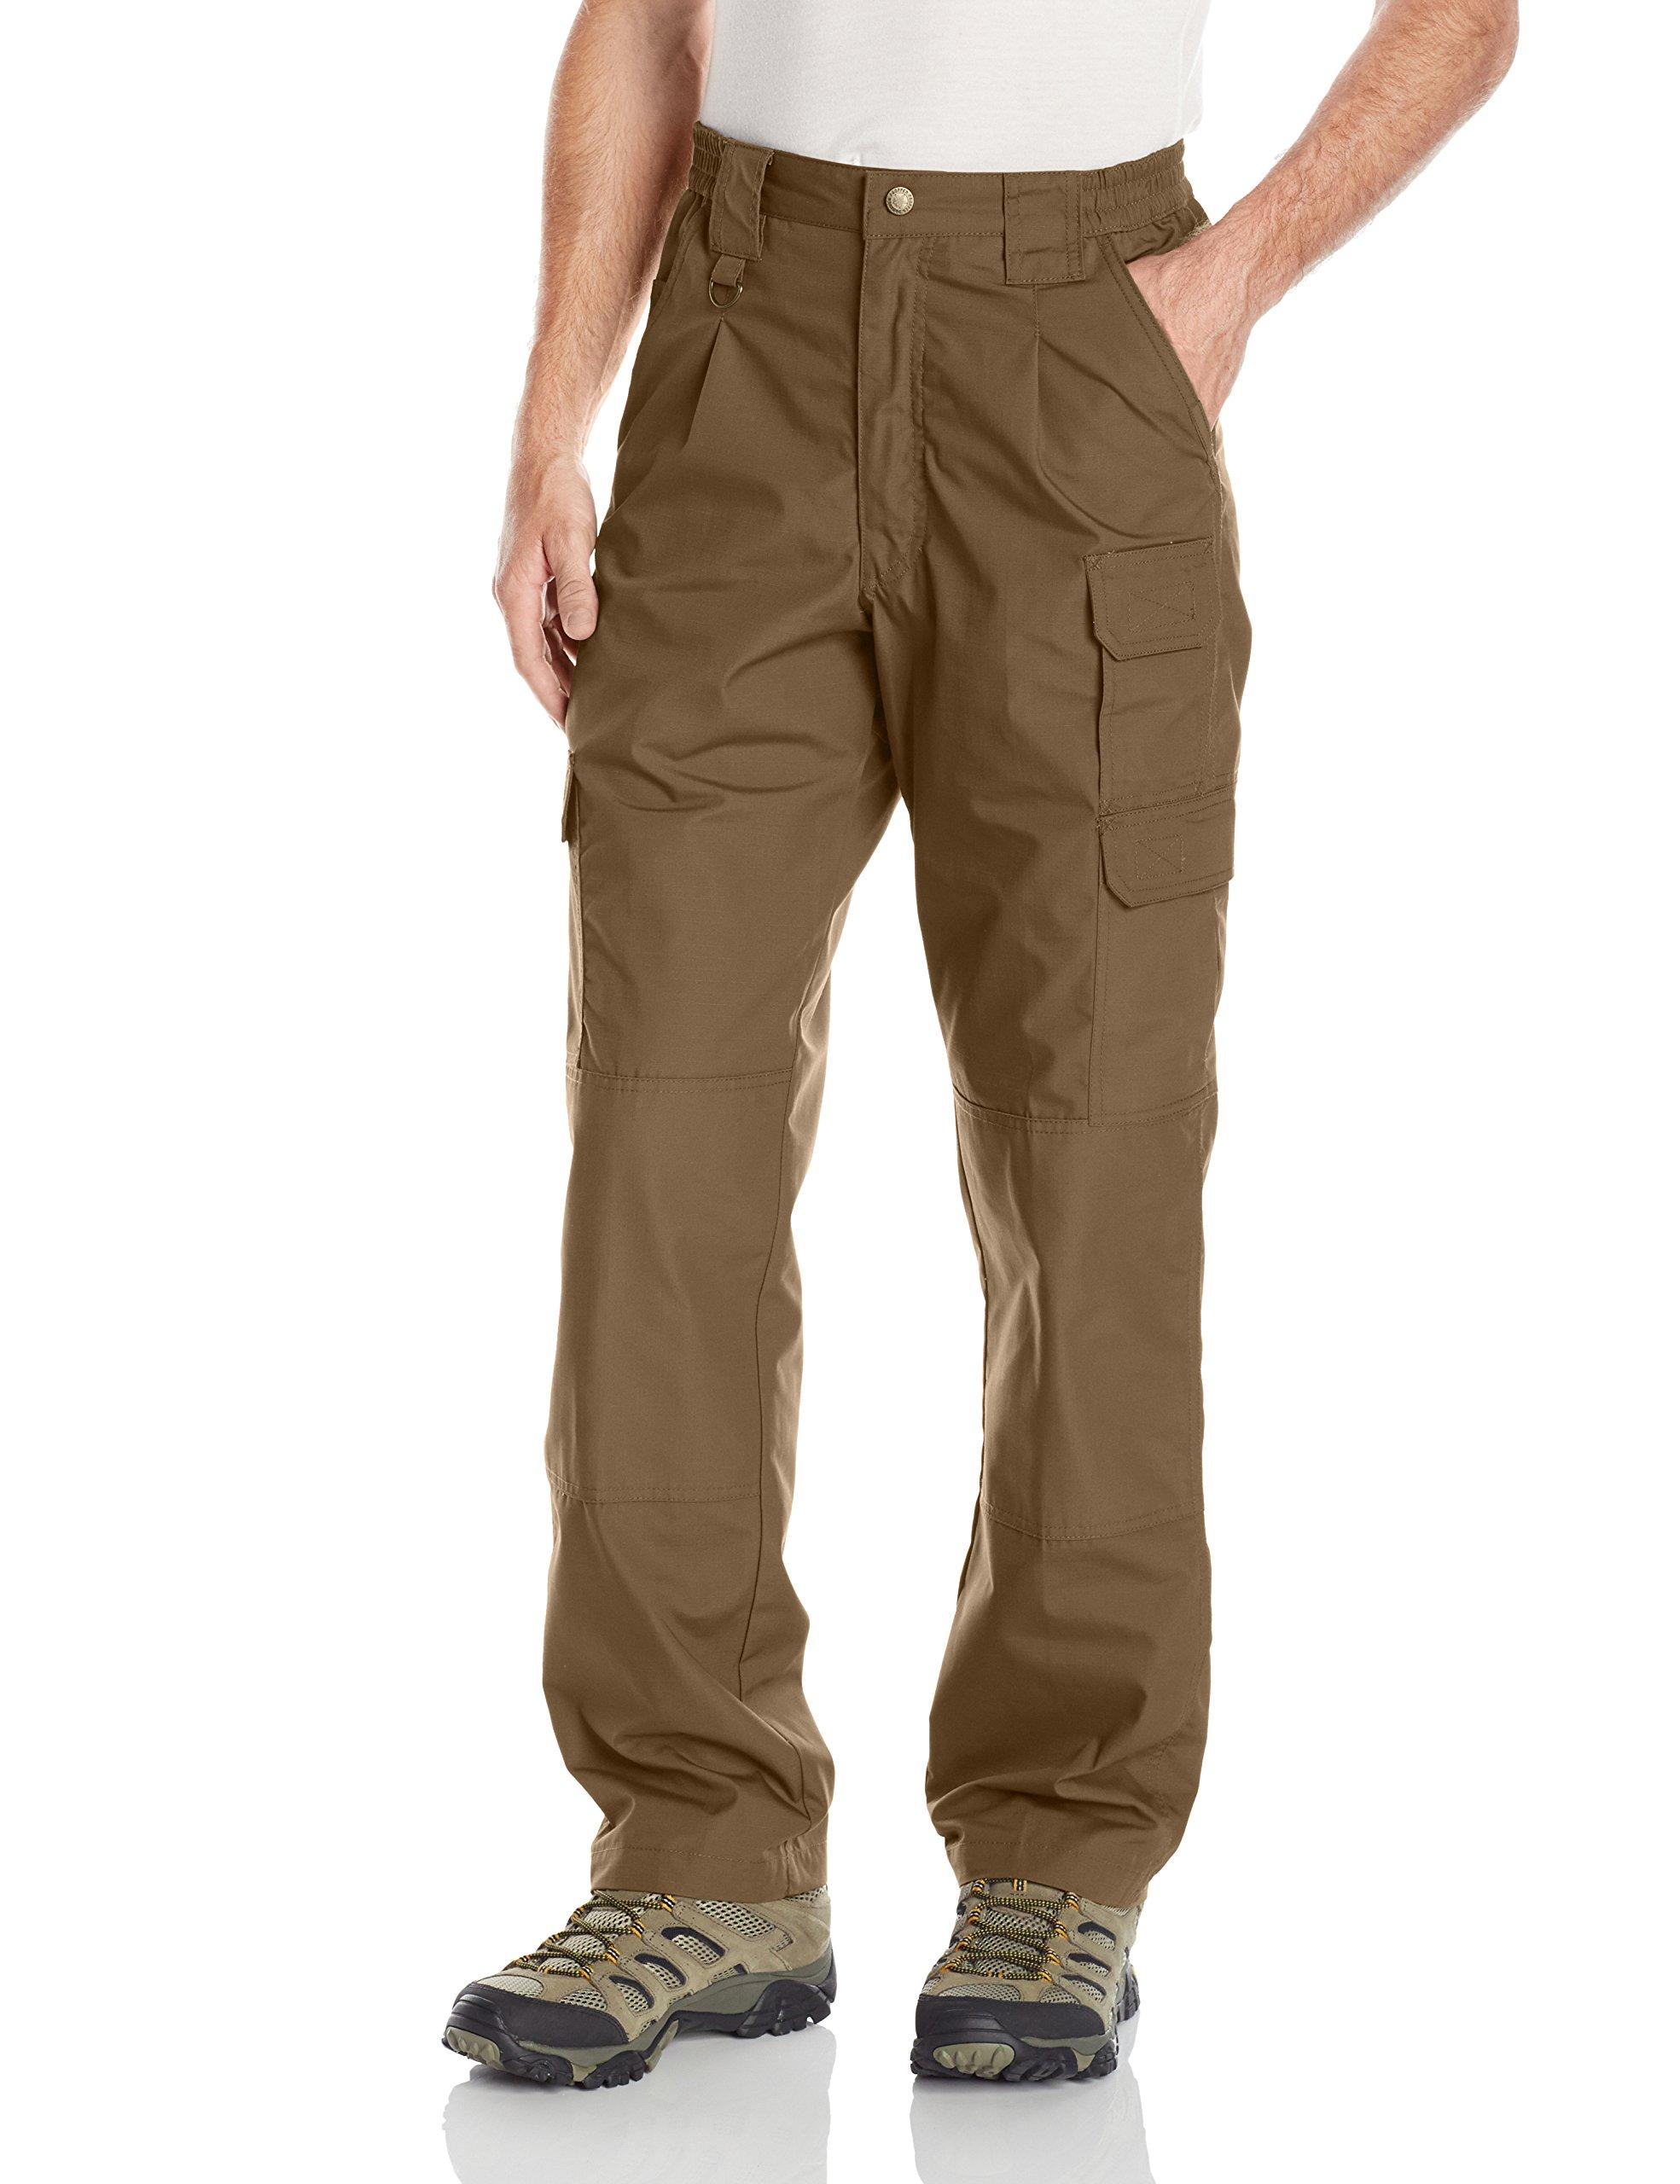 Propper Men's Lightweight Tactical Pants, Earth, 42'' x 32''